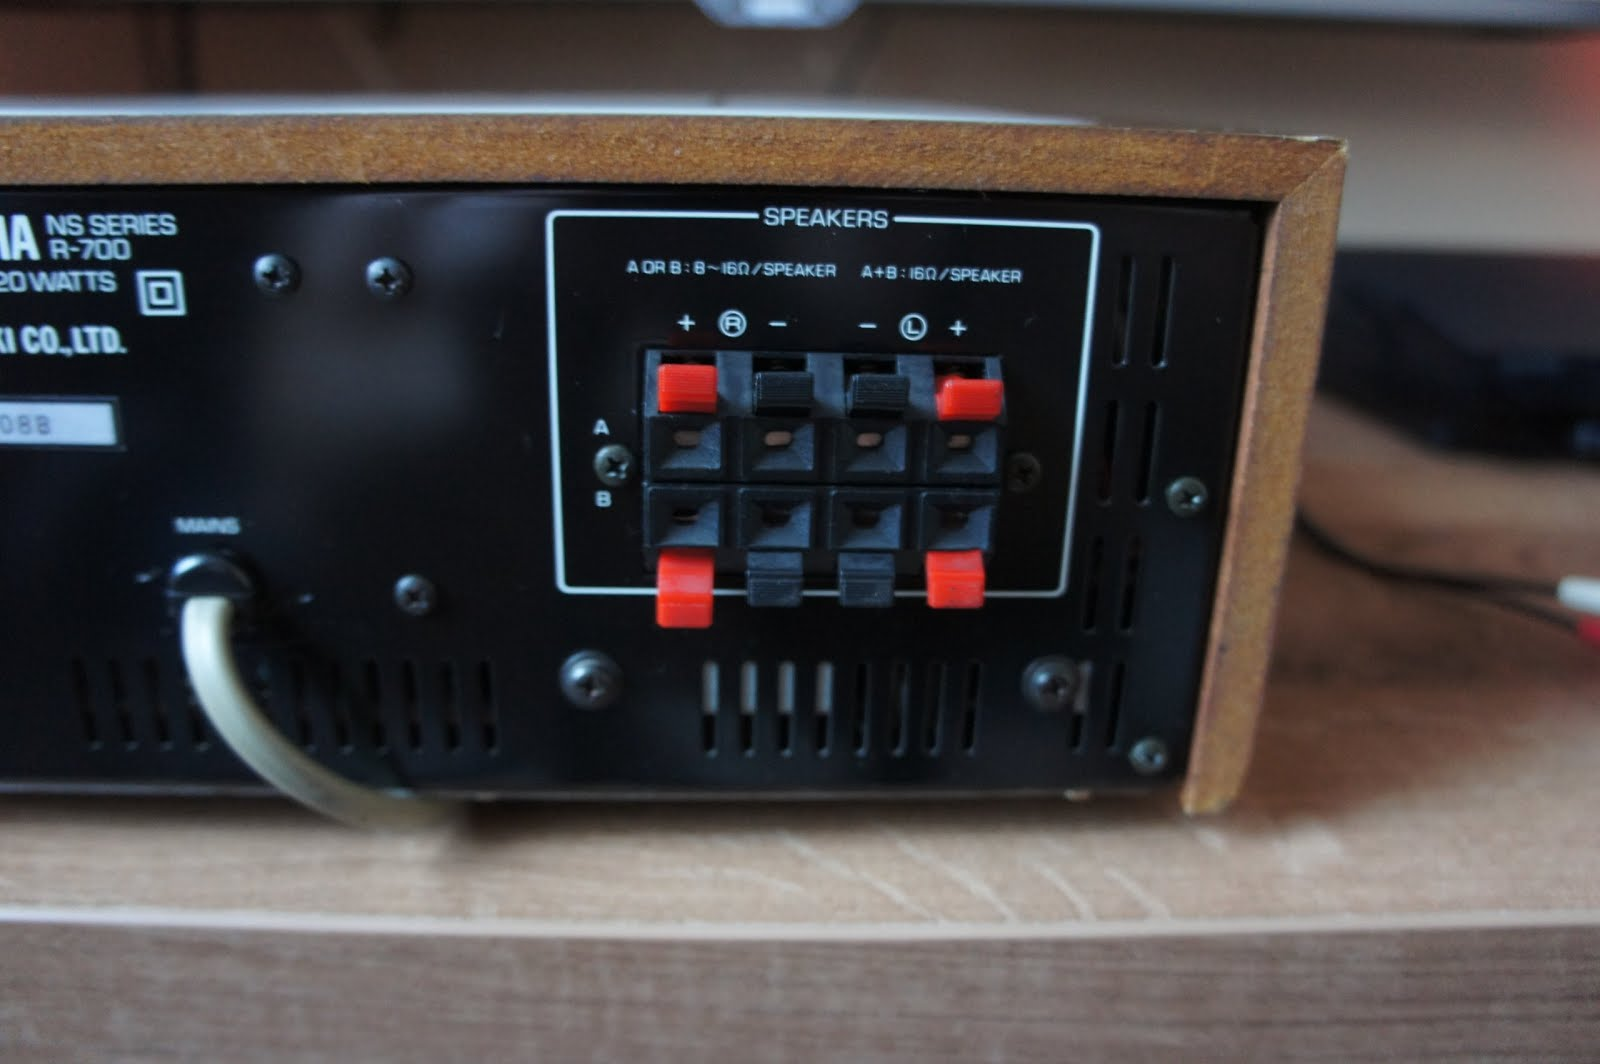 yamaha r 700 stereo receiver audiobaza. Black Bedroom Furniture Sets. Home Design Ideas